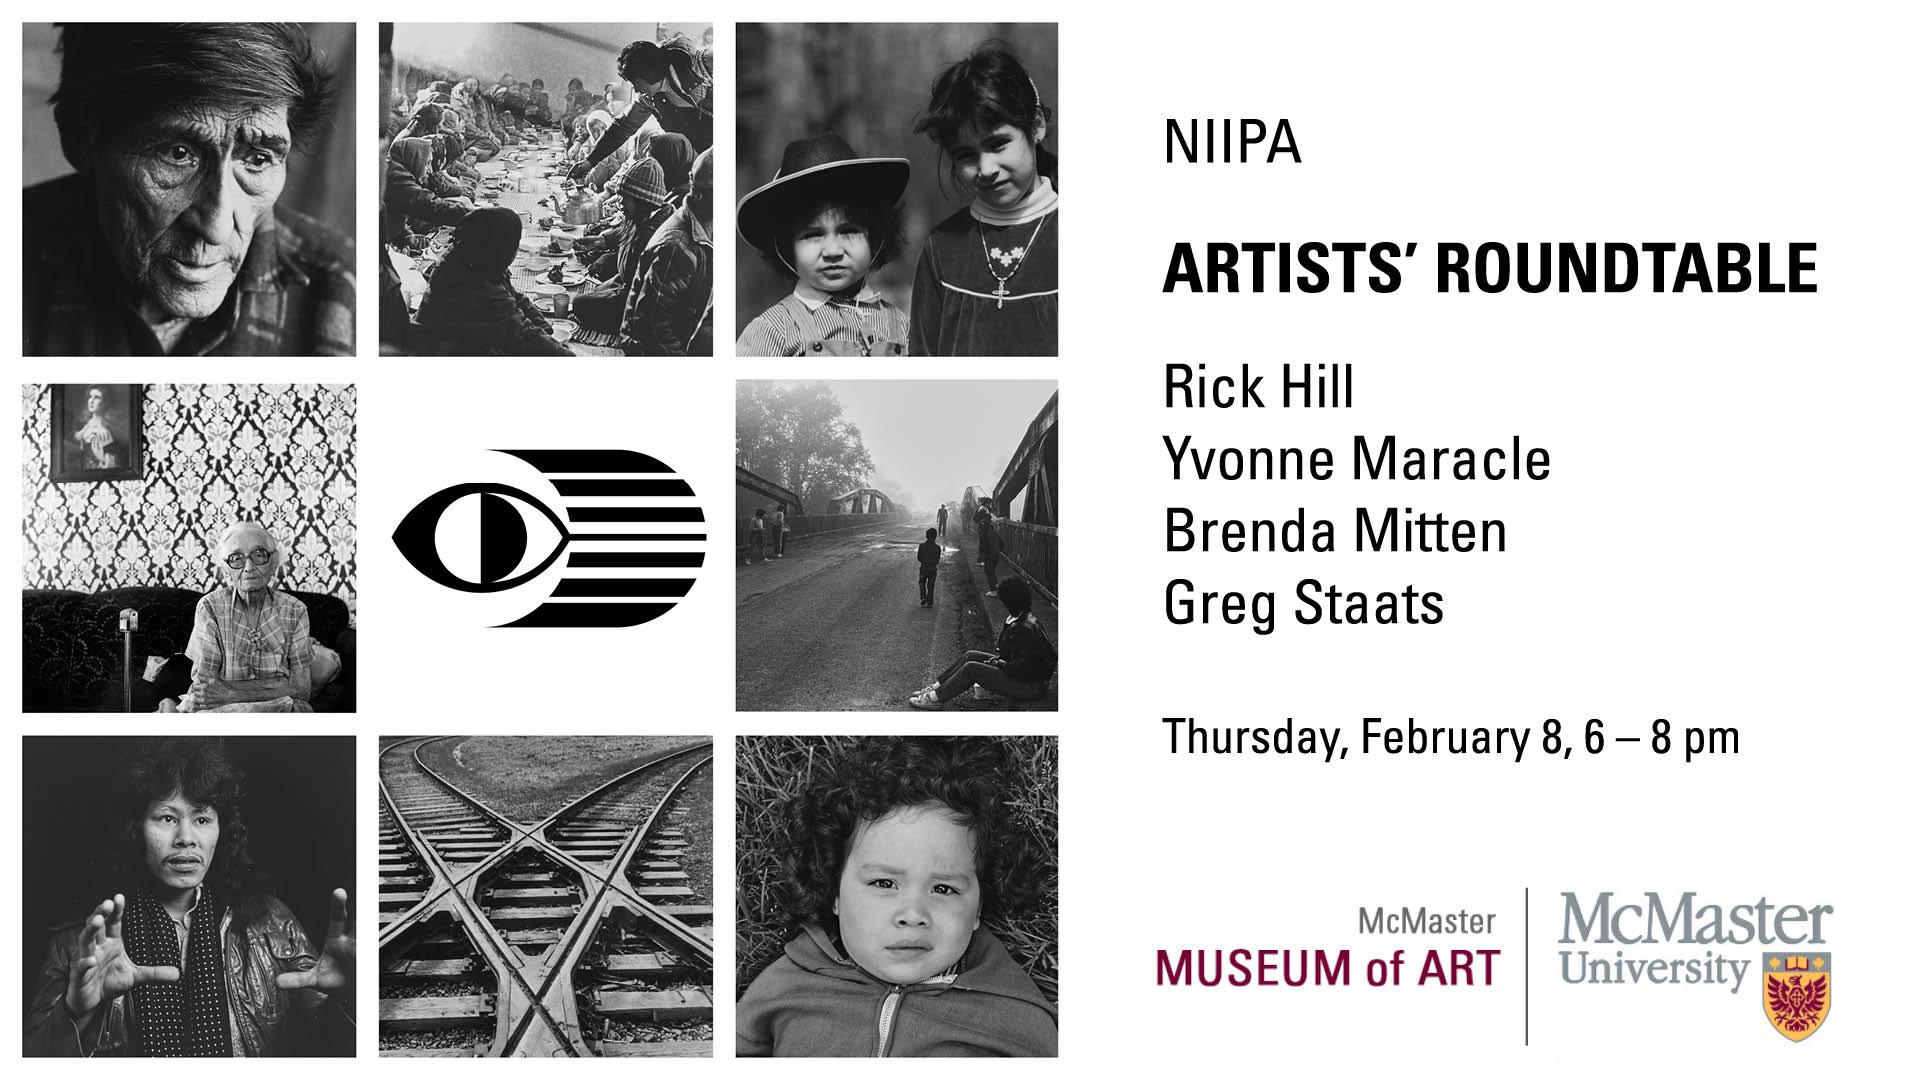 NIIPA Artists Roundtable